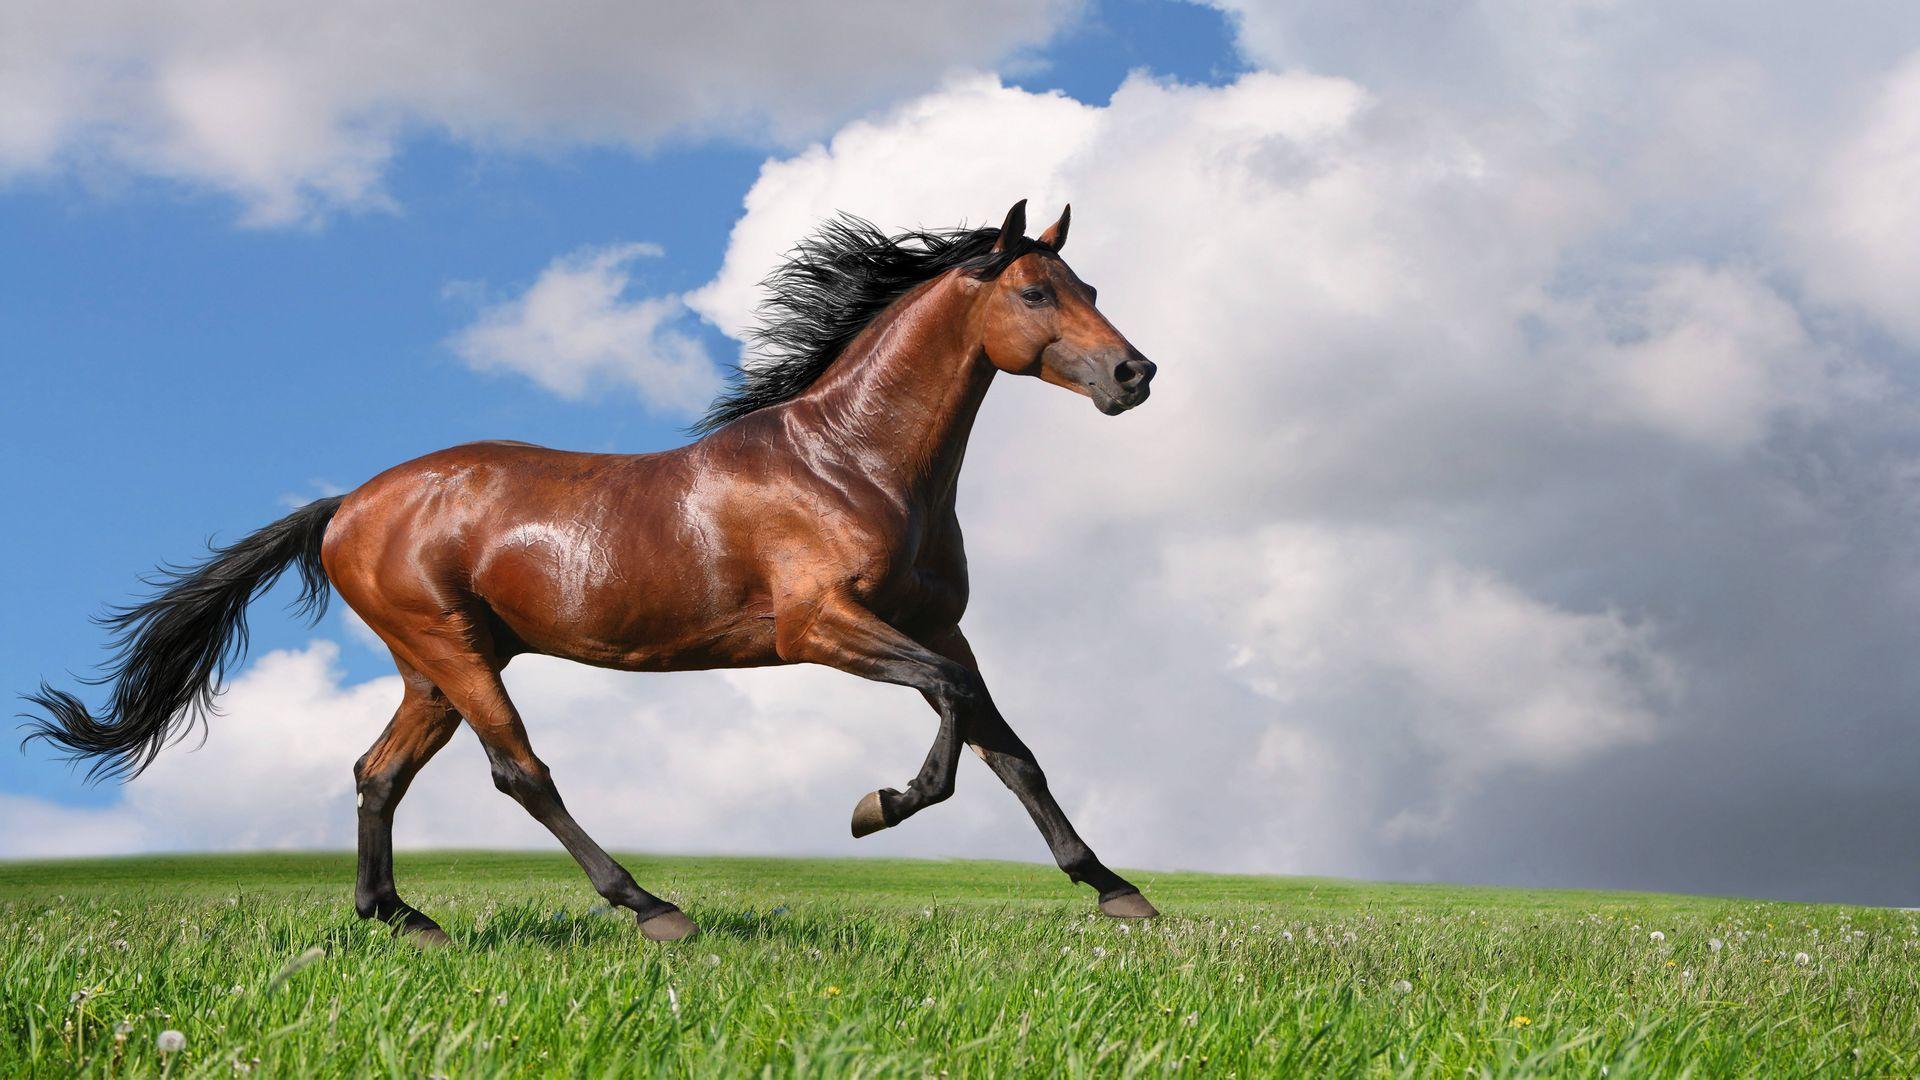 He Has Bay Horses